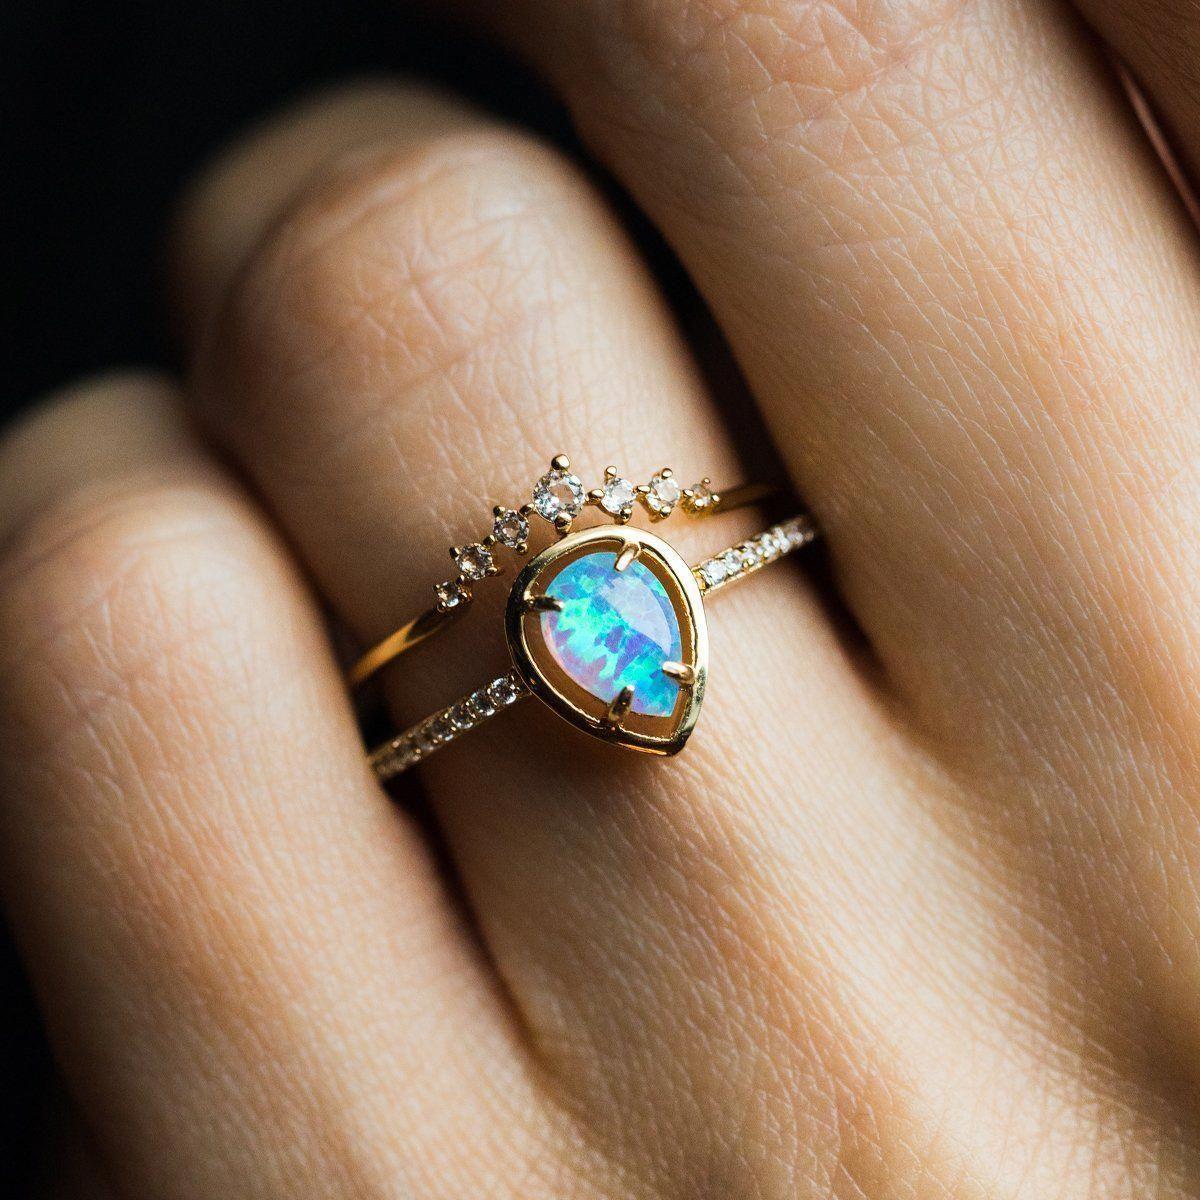 Jewelry OrganizerNecklace AestheticEarrings diyWedding